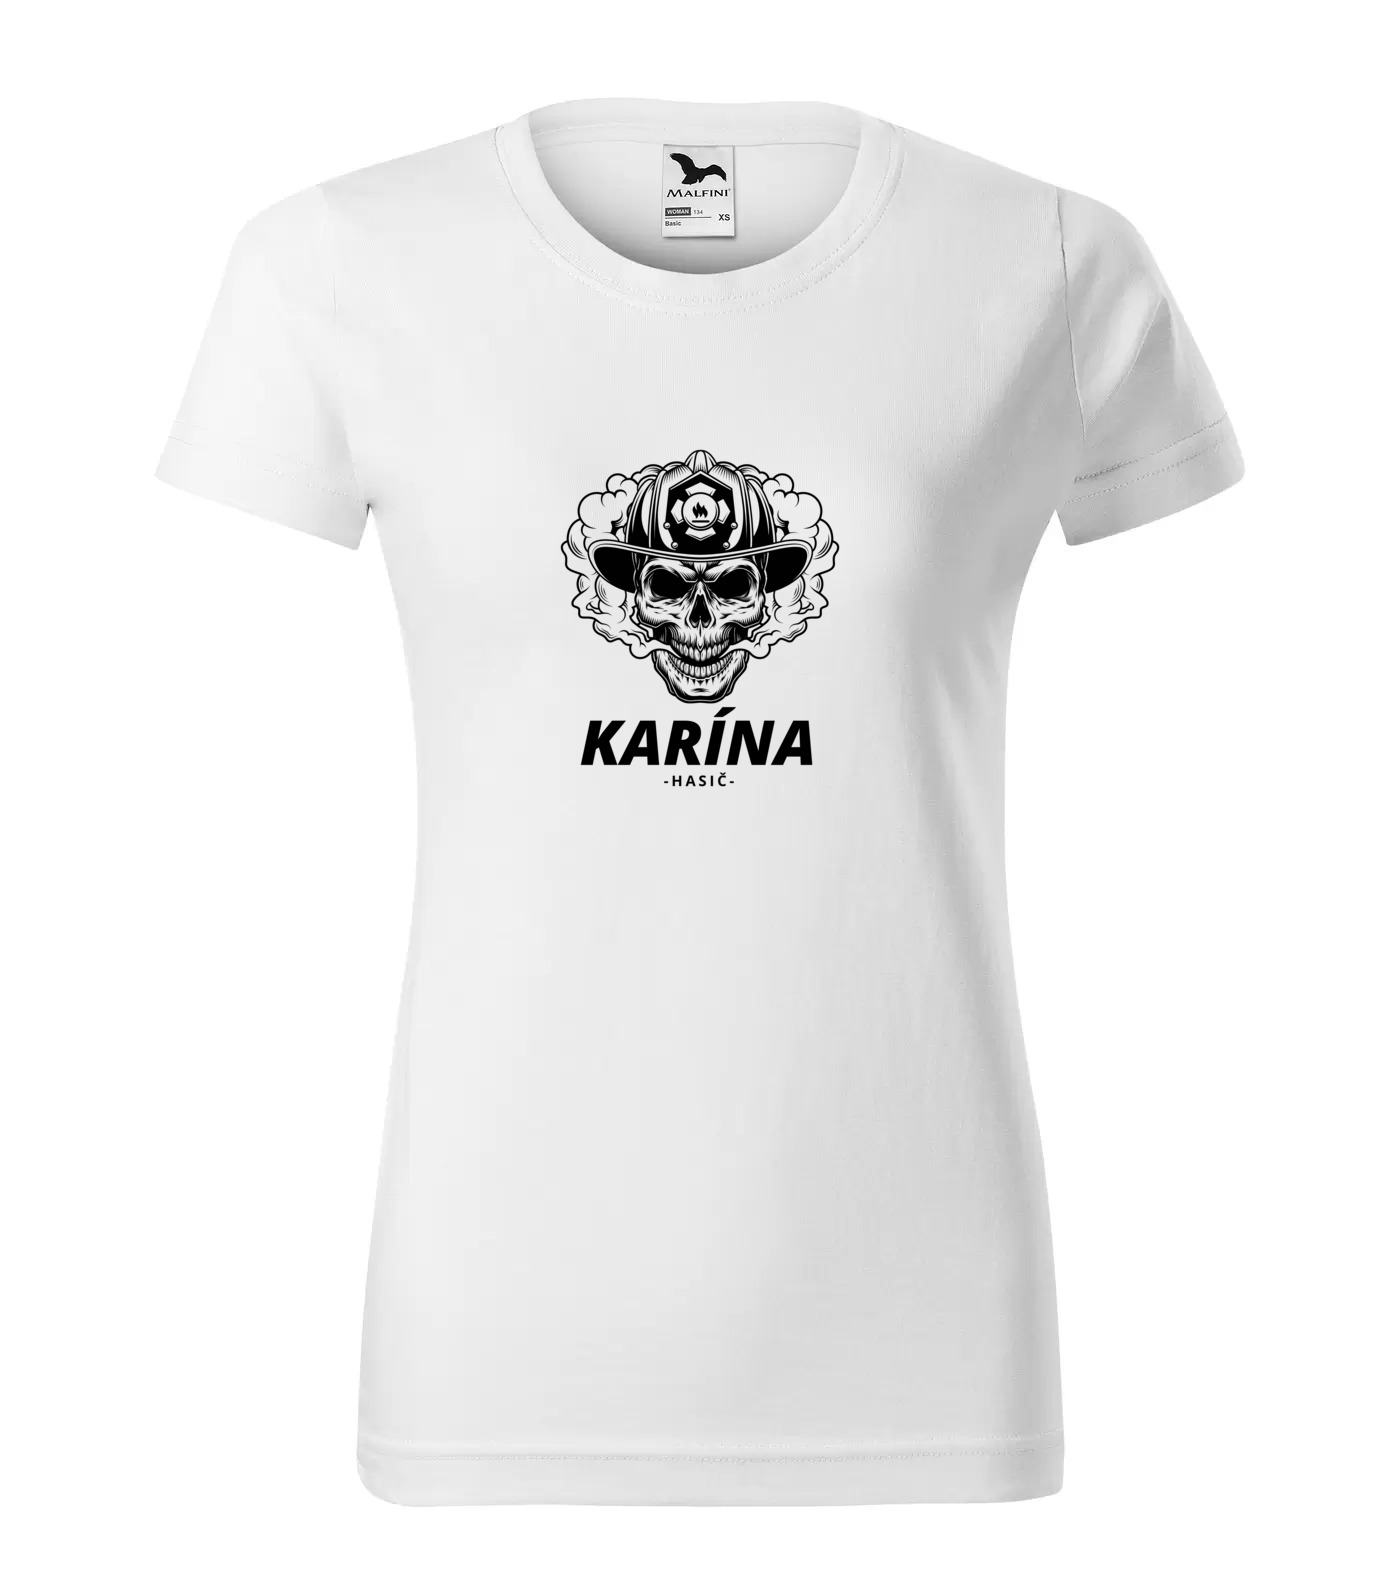 Tričko Hasič Karína